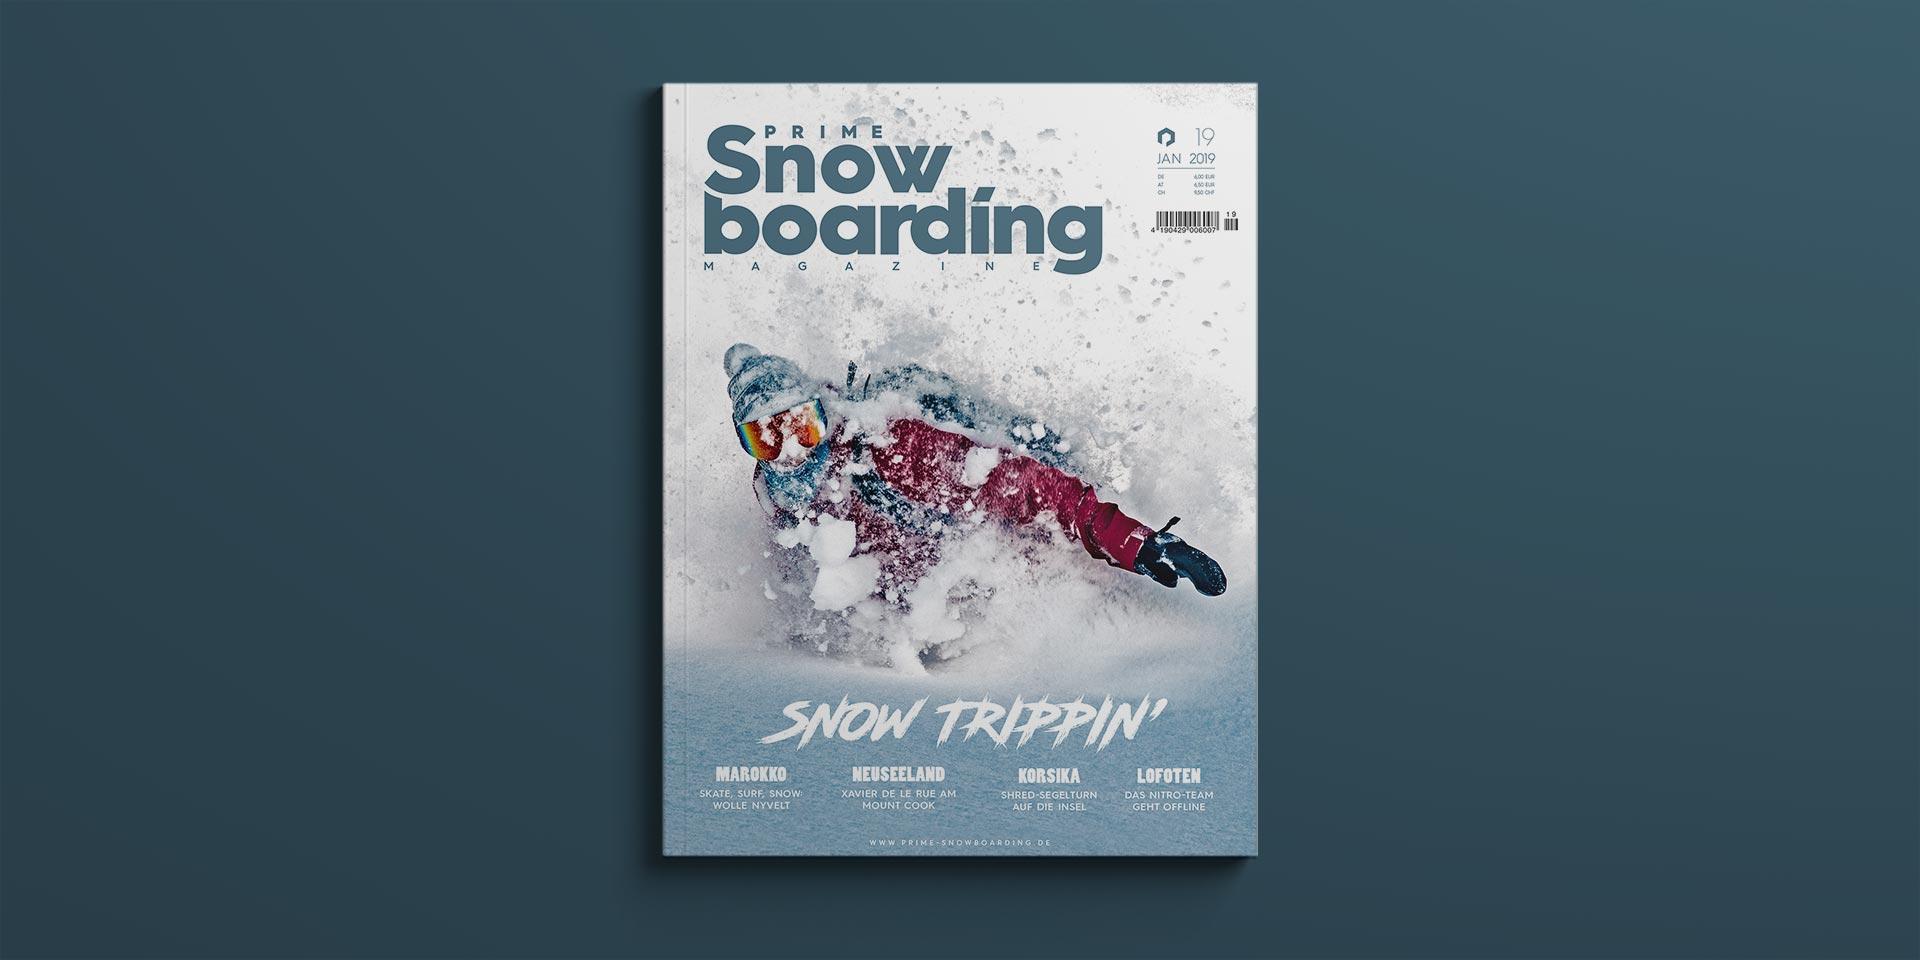 Prime-Snowboarding-Snow-Trippin-06